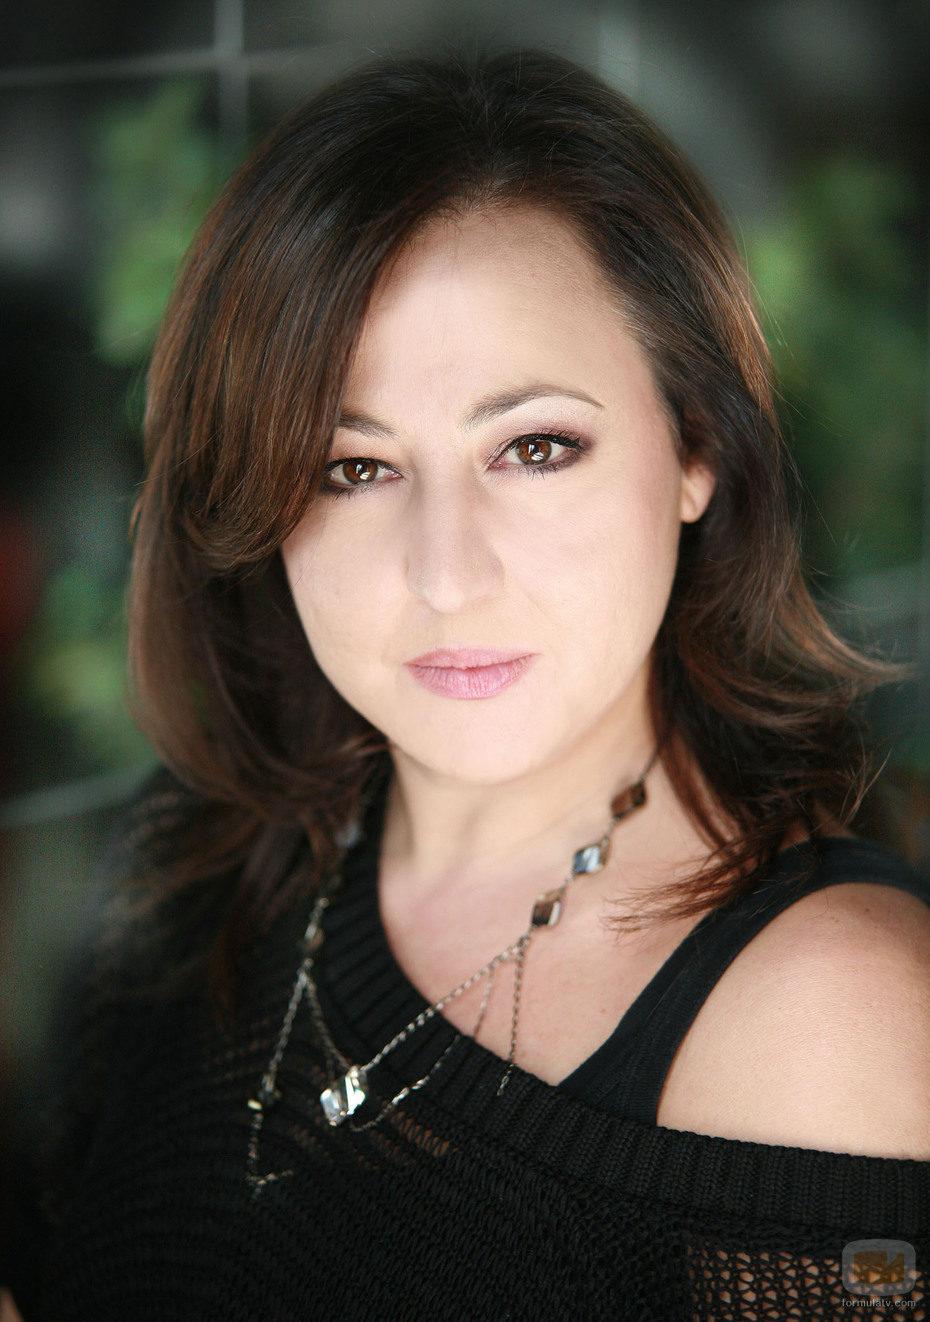 Aida 1 temporada online dating 5